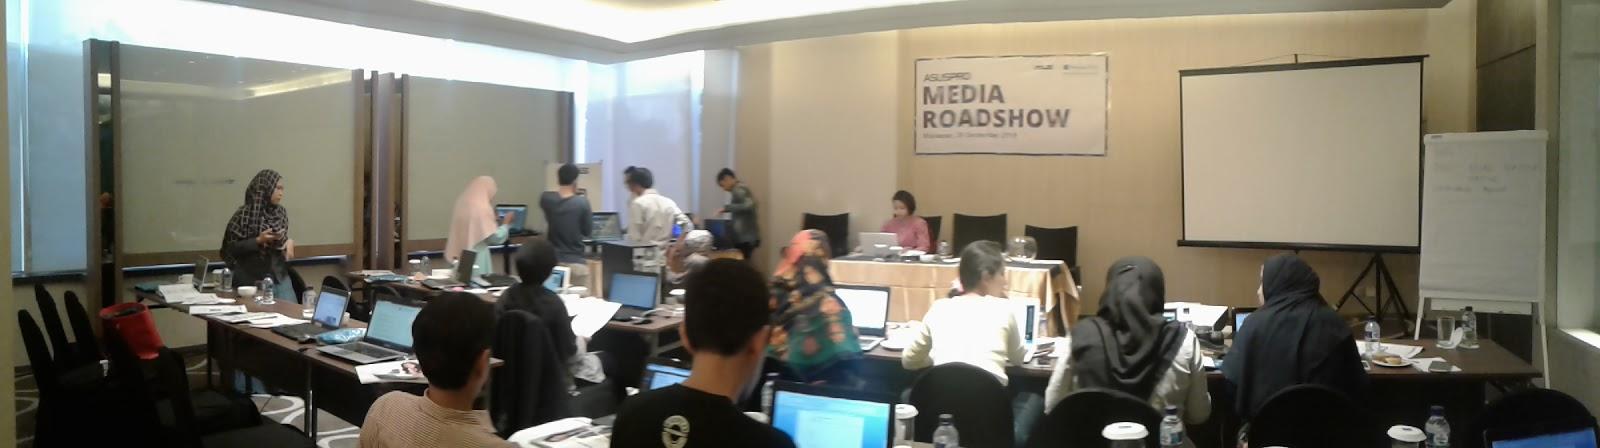 ASUSPRO Media Roadshow